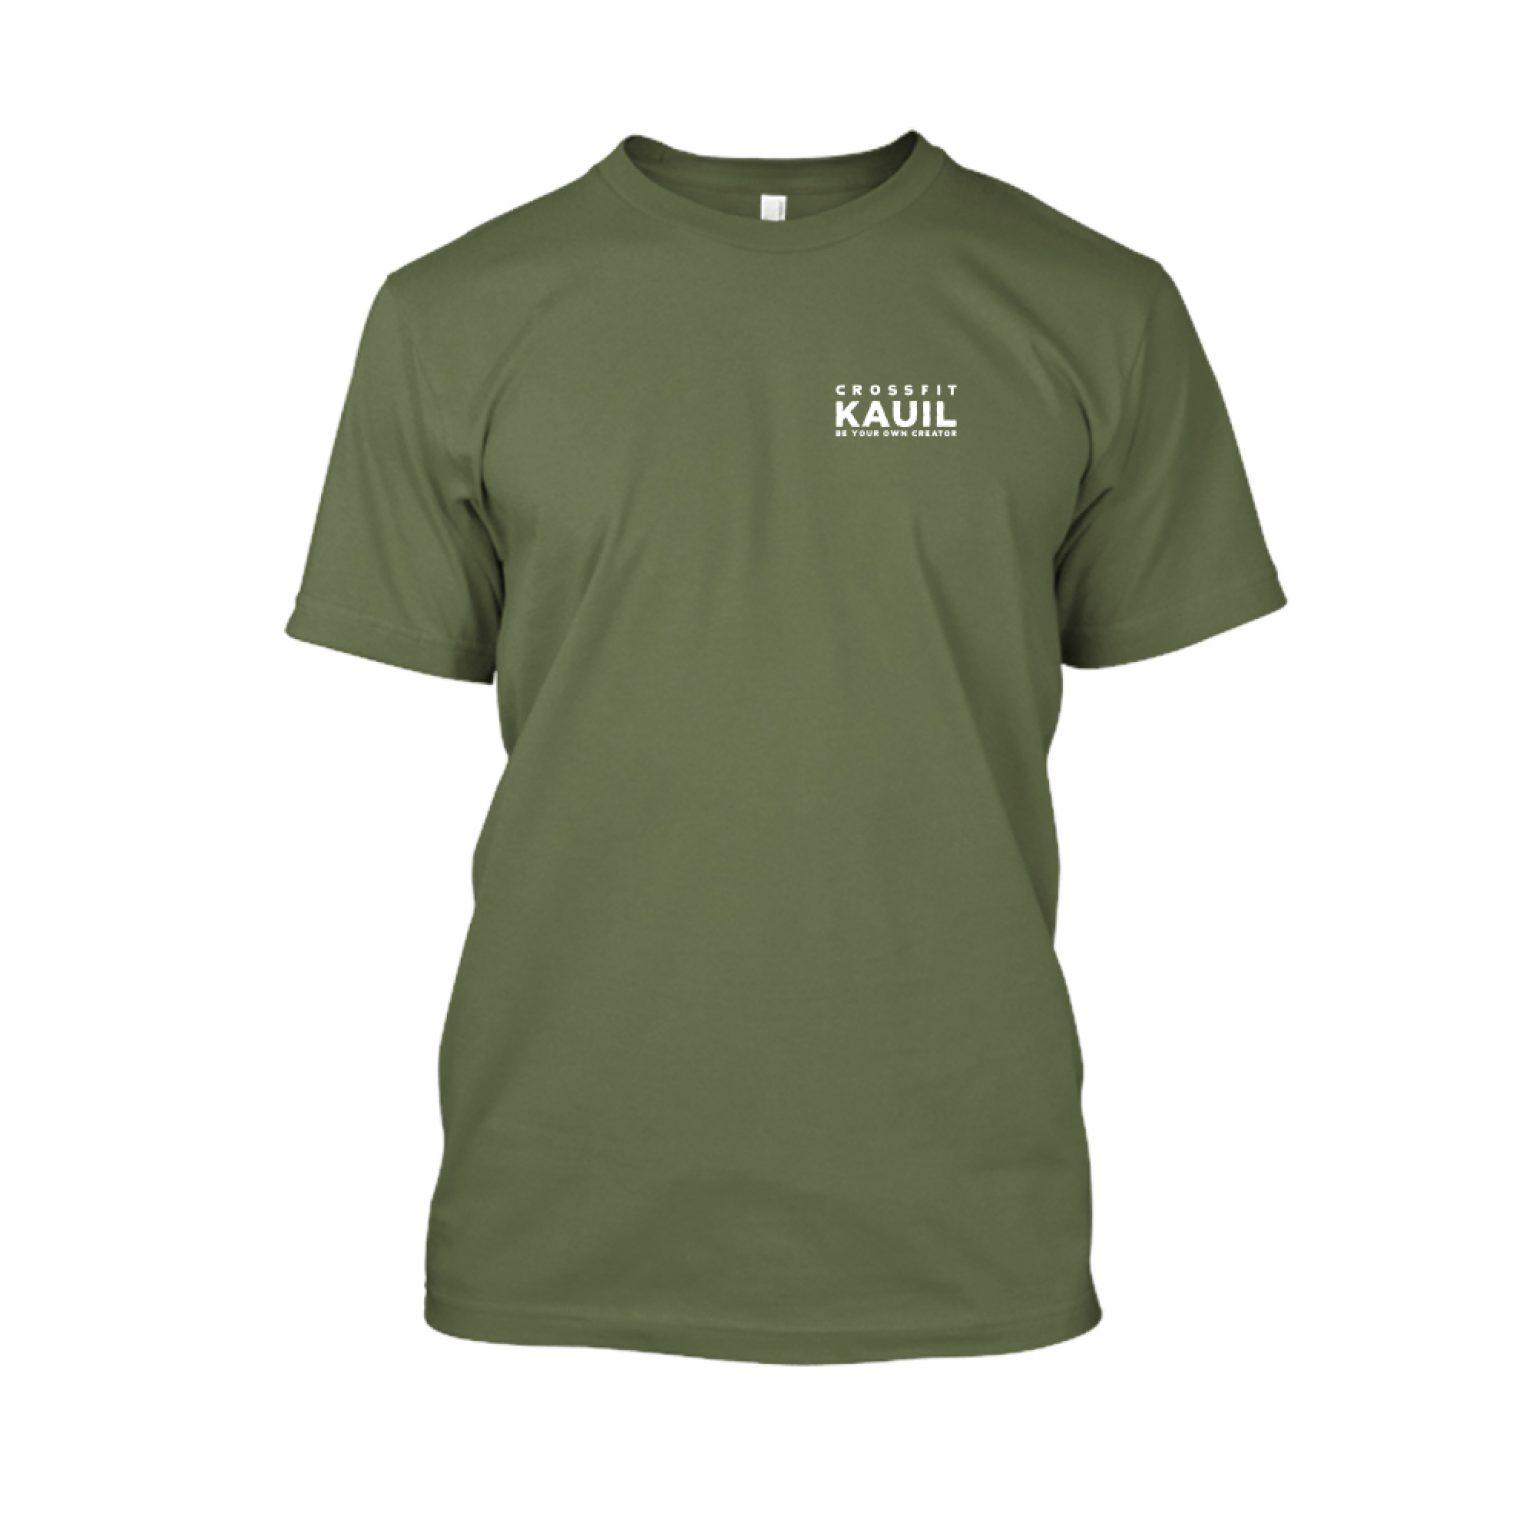 Herren Shirt Army2 weiss front